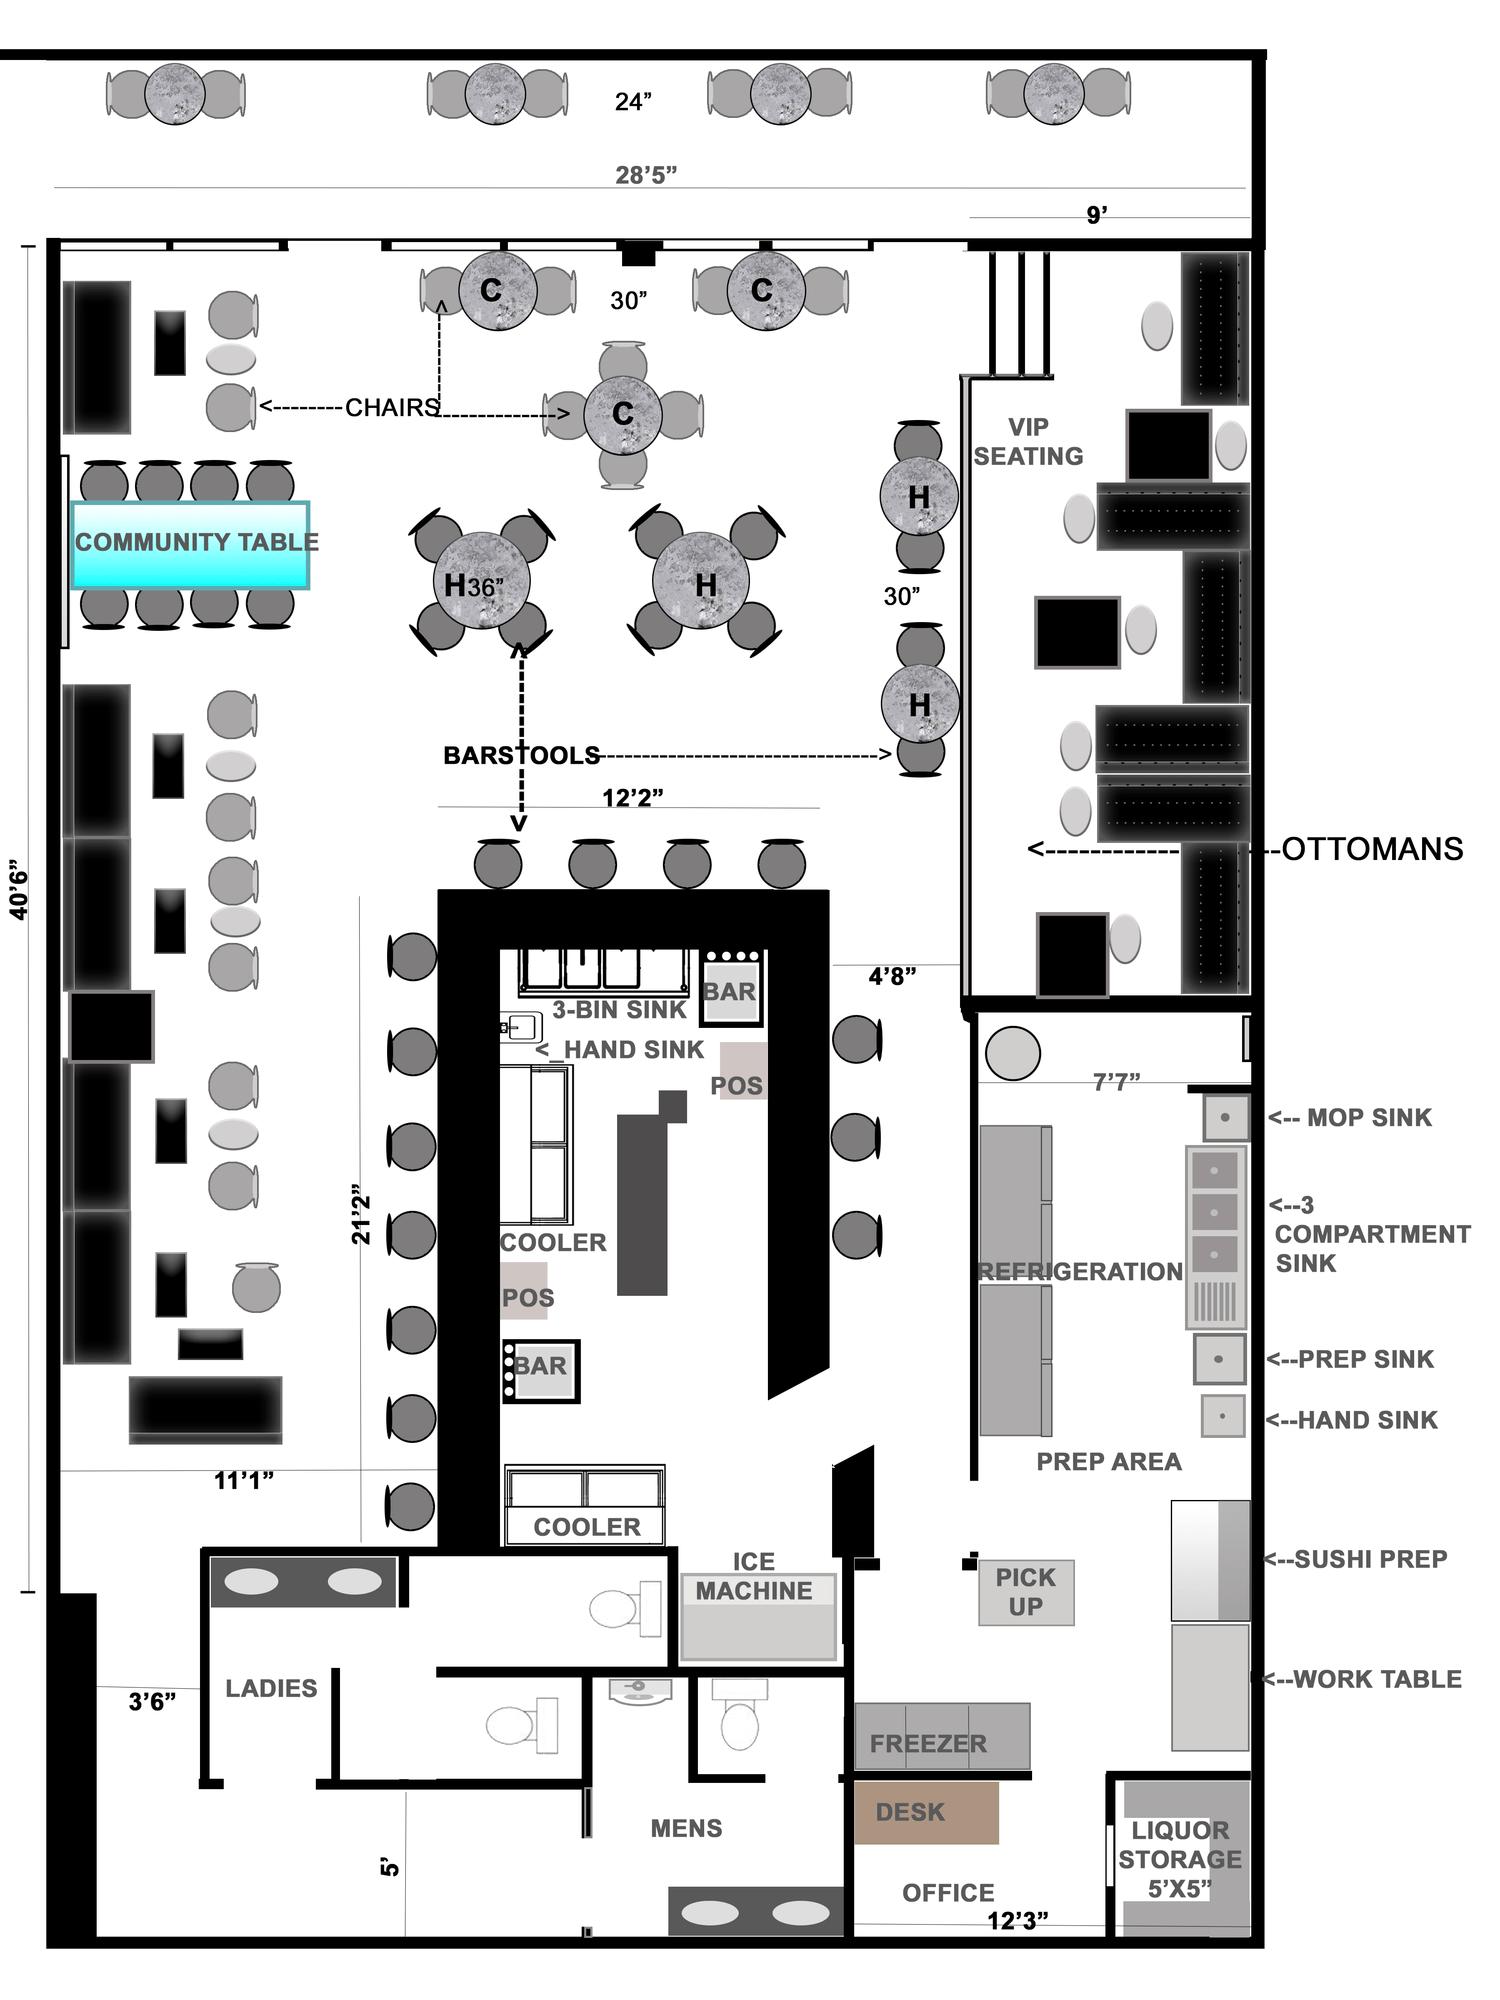 Building Sign Diagram